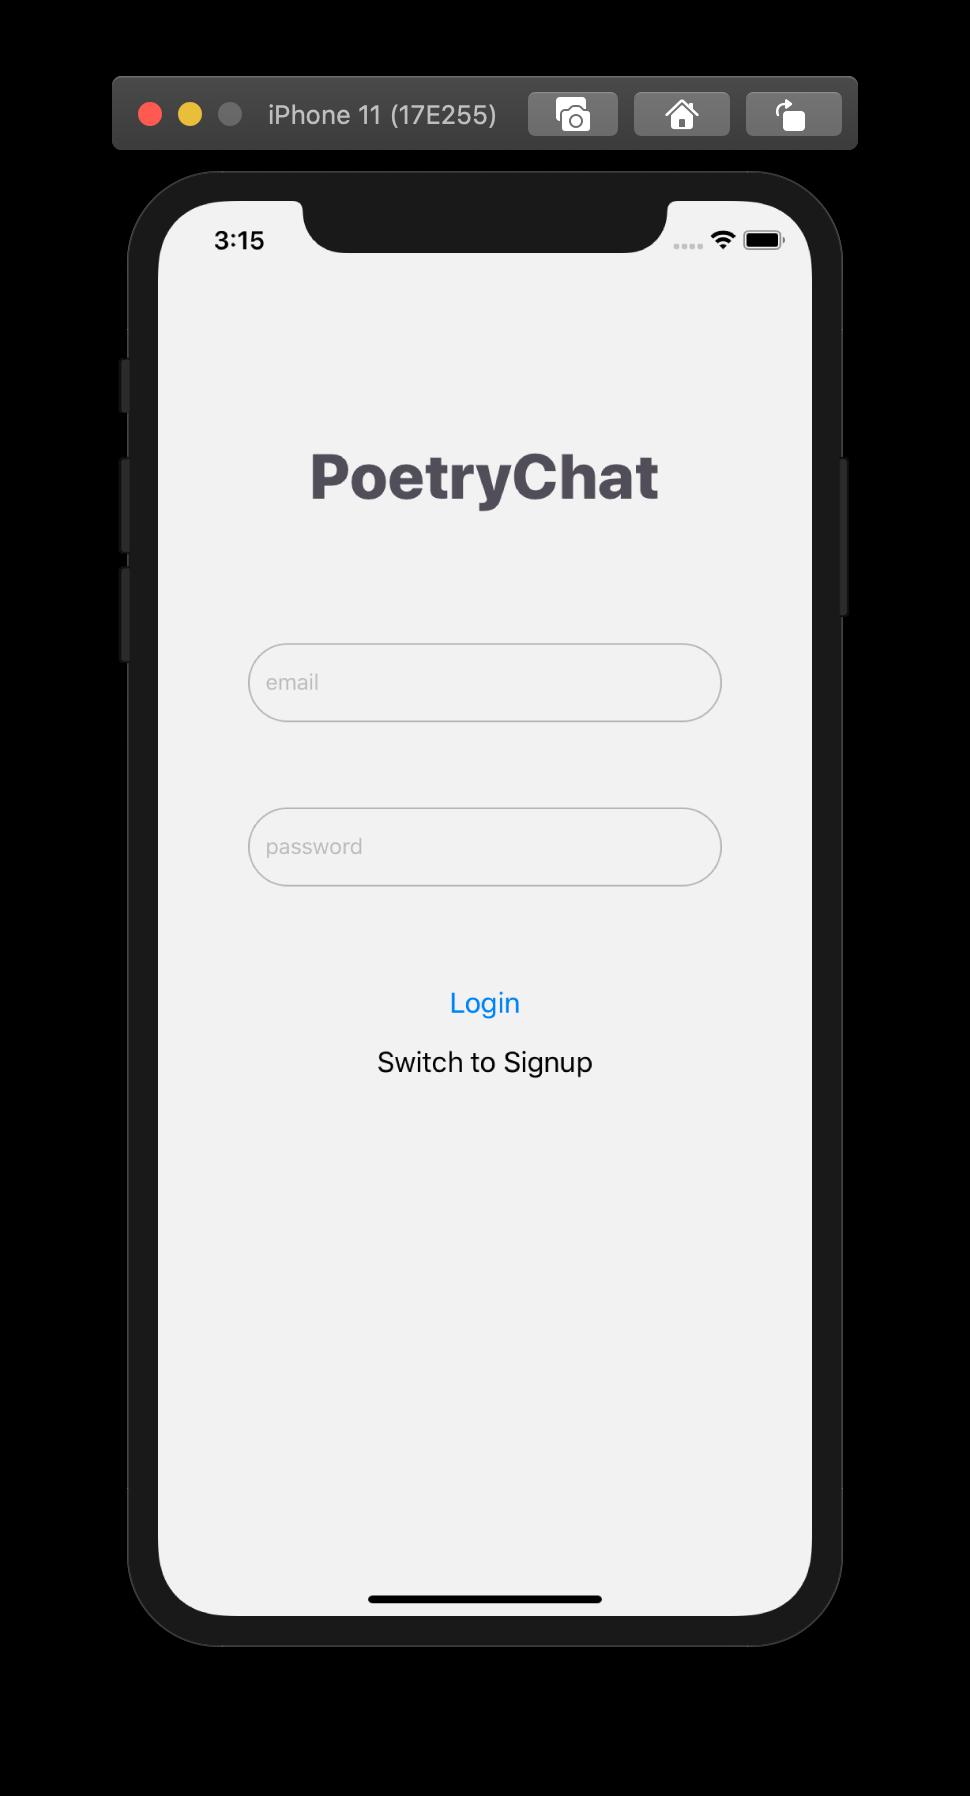 login screen of the app